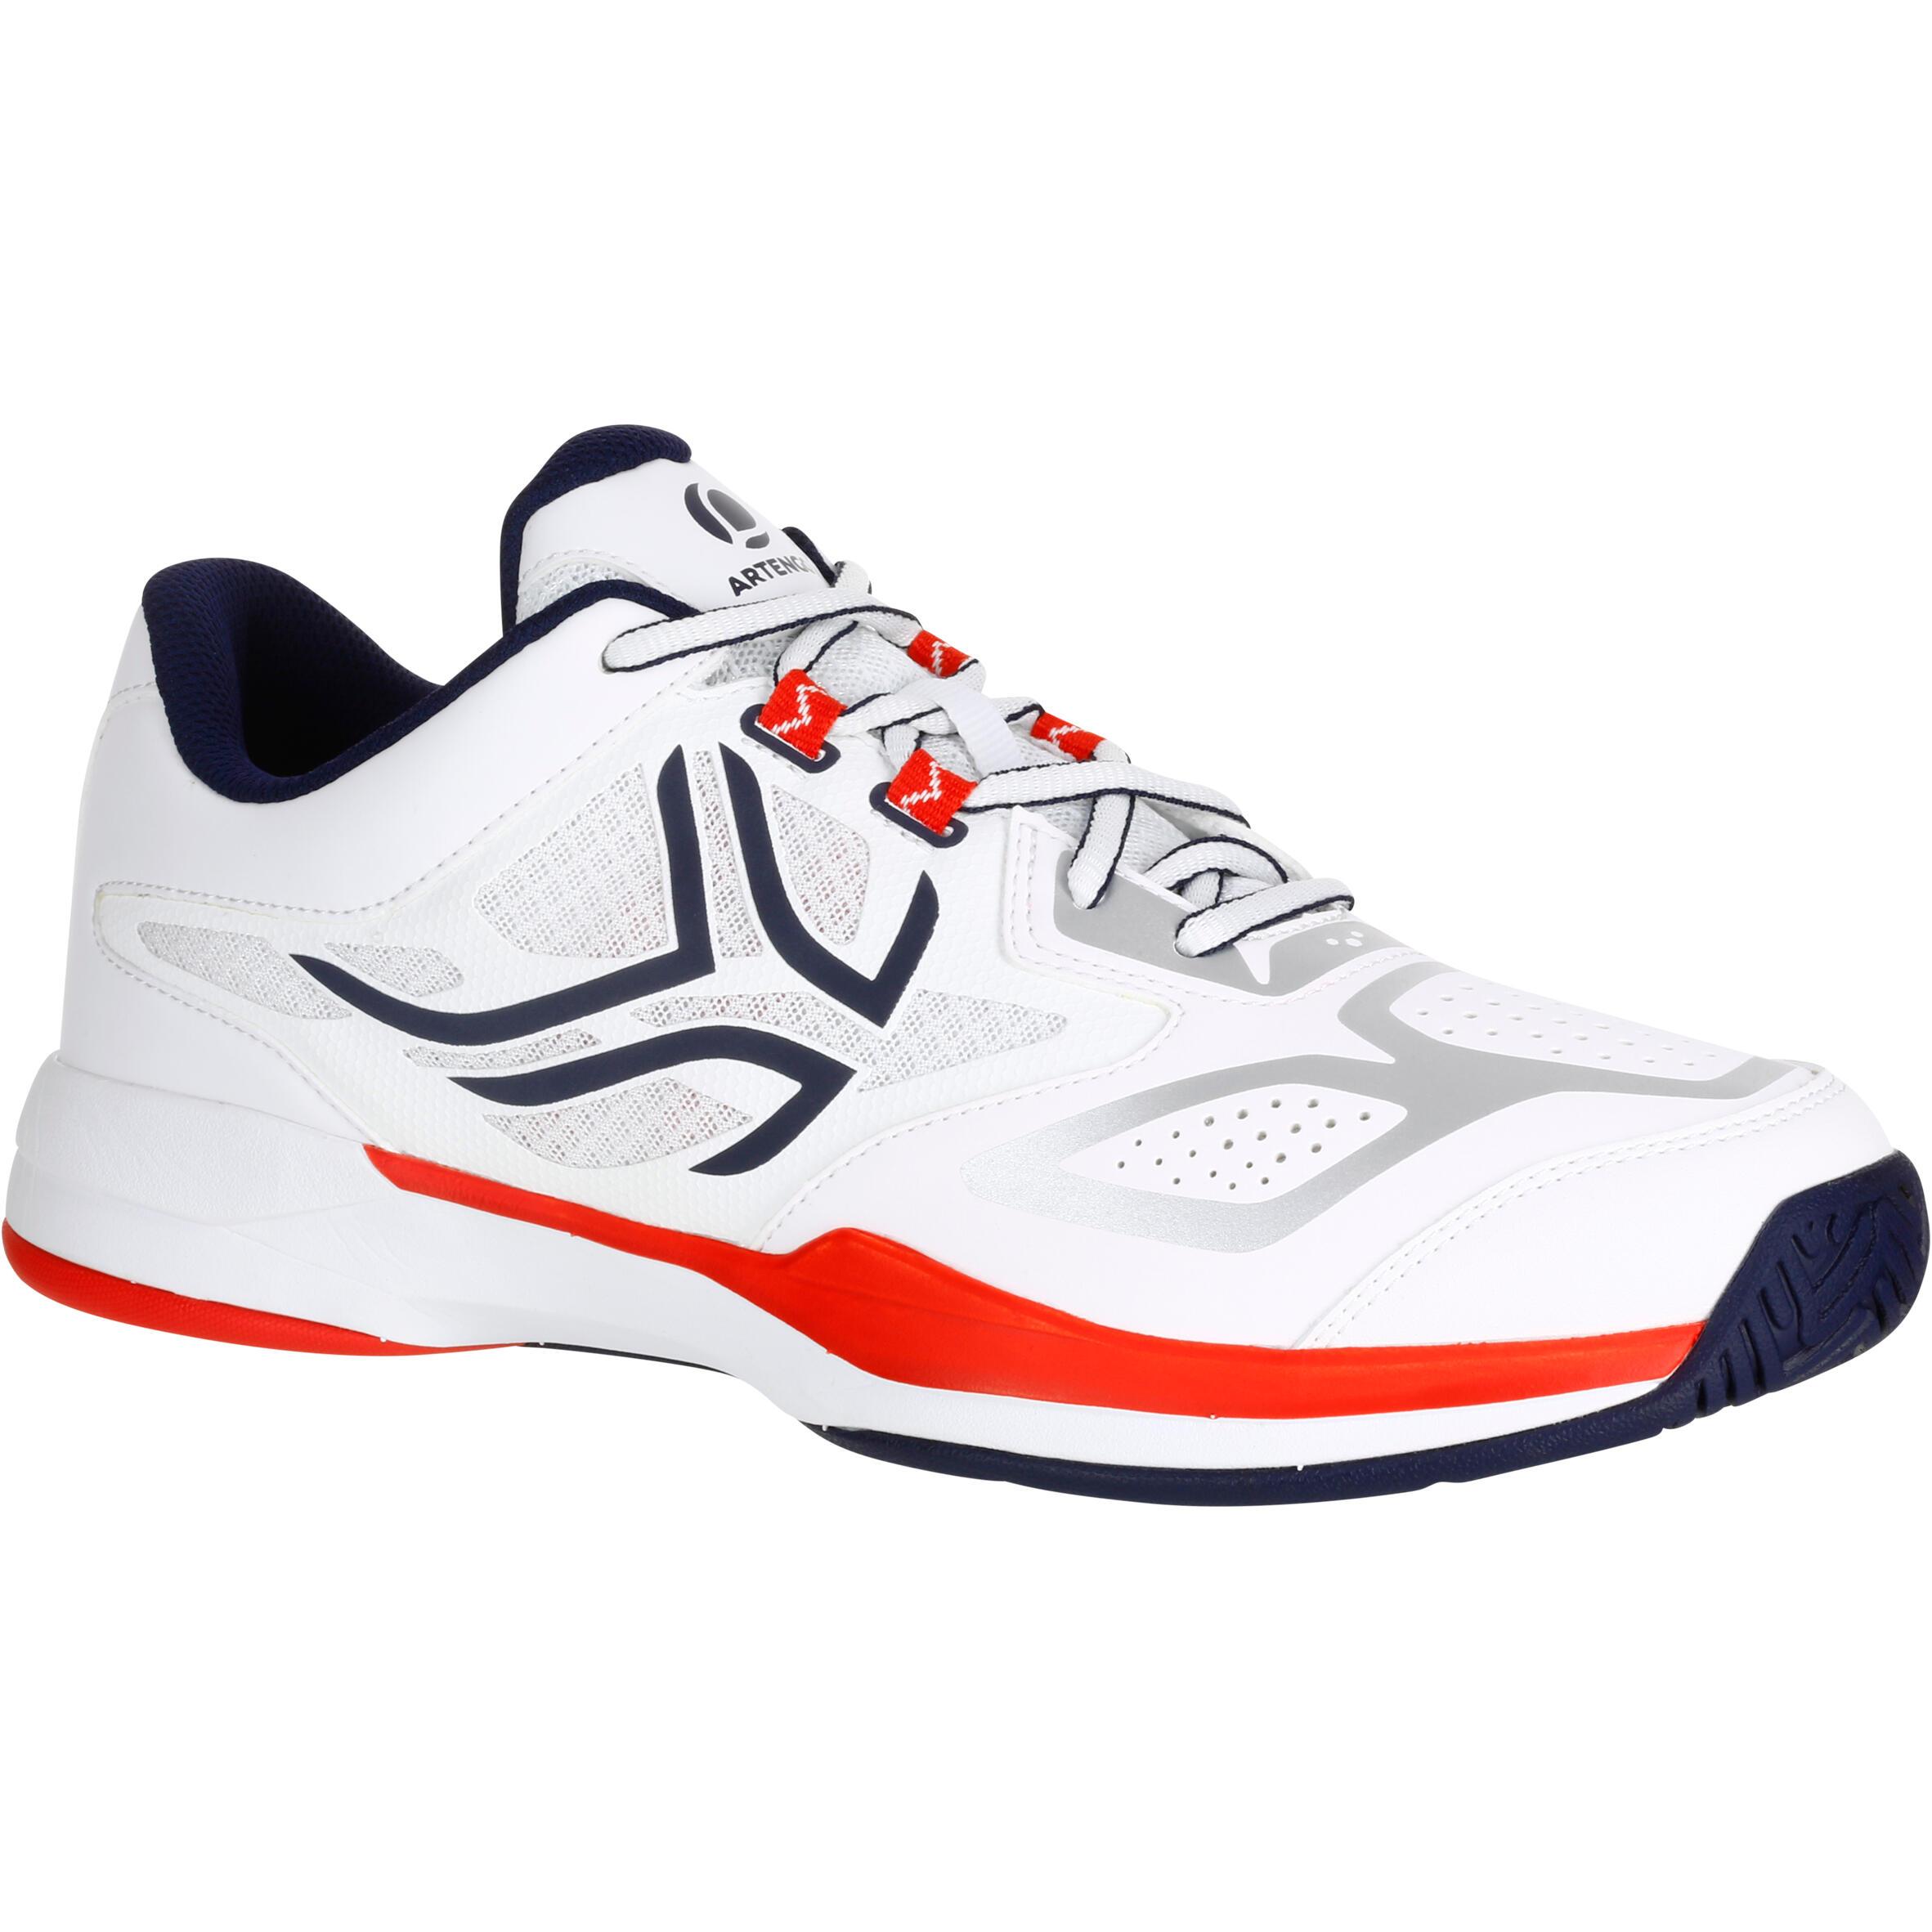 new concept 0cad1 ebe33 chaussure tennis artengo